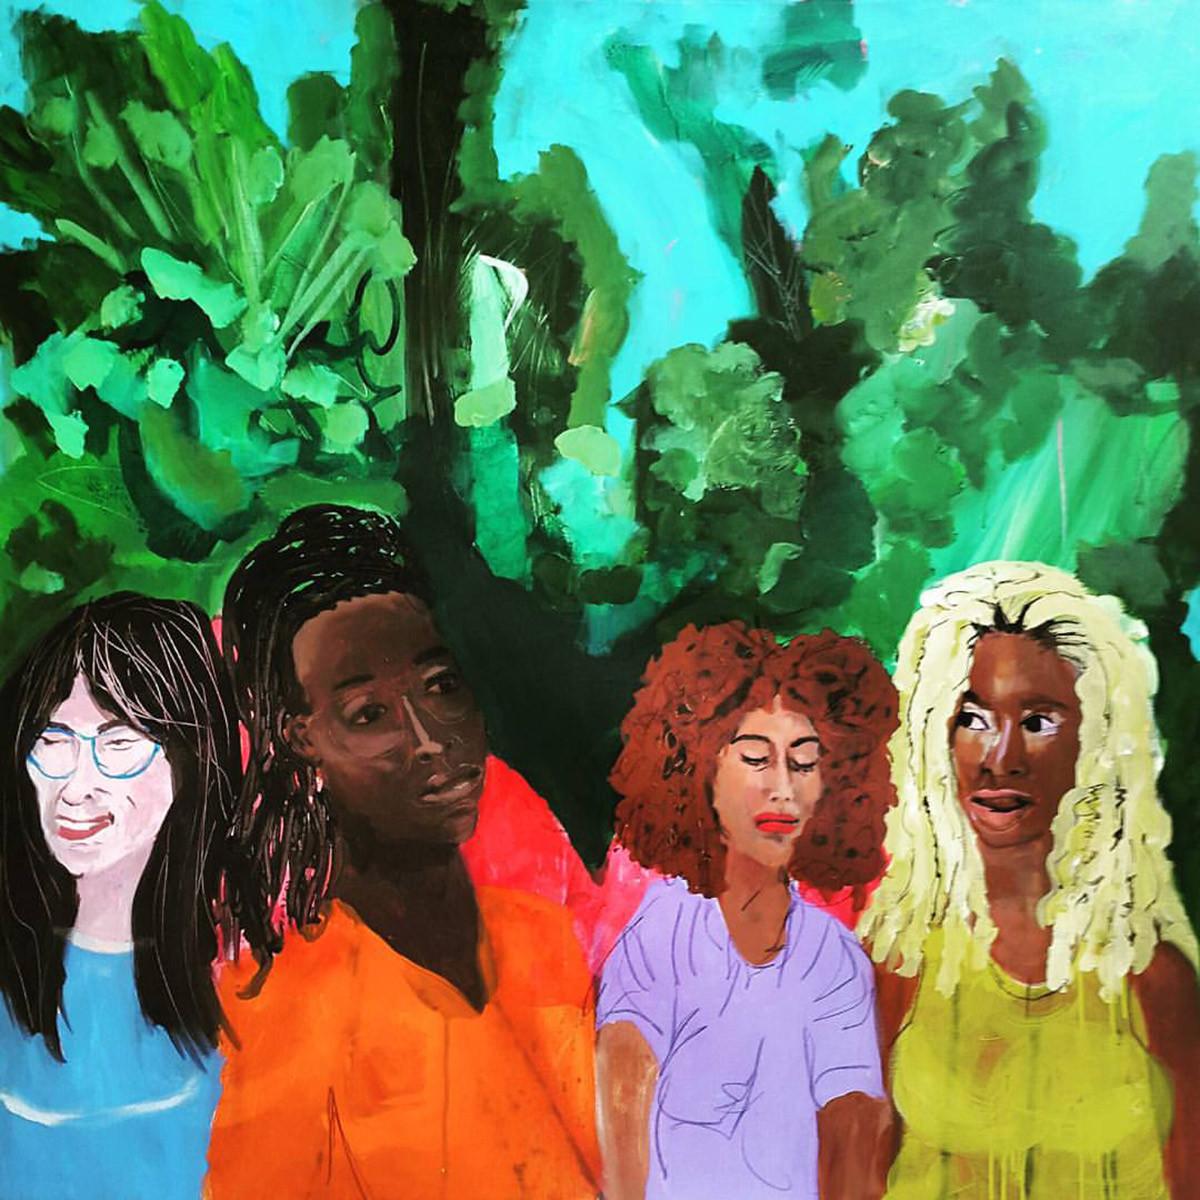 The  Harlem Exhibition by Michal Litter Gavrielov